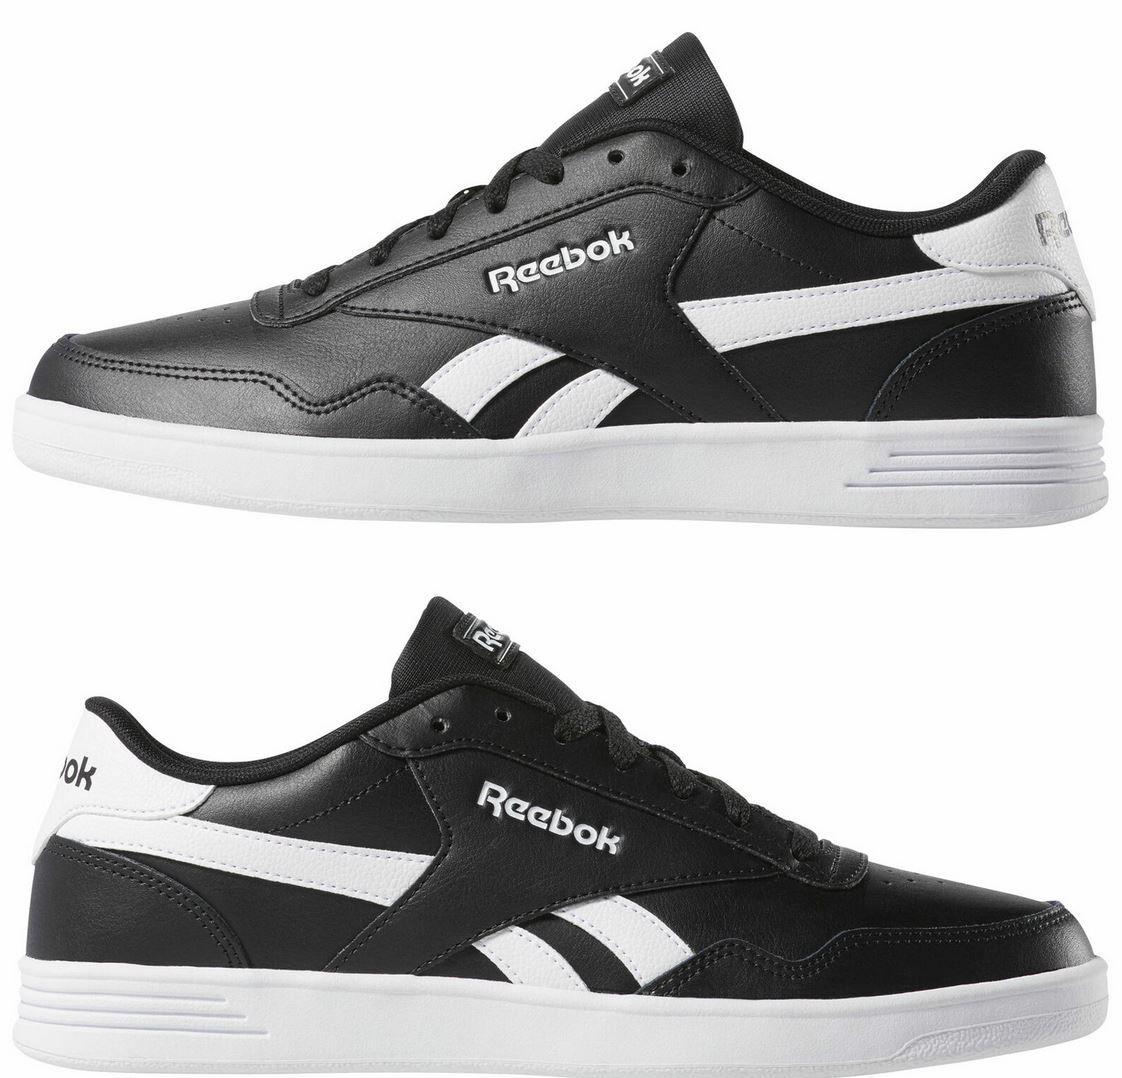 Reebok Royal Techque T men Trainers Herren Sneaker für 24,35€ (statt 30€)